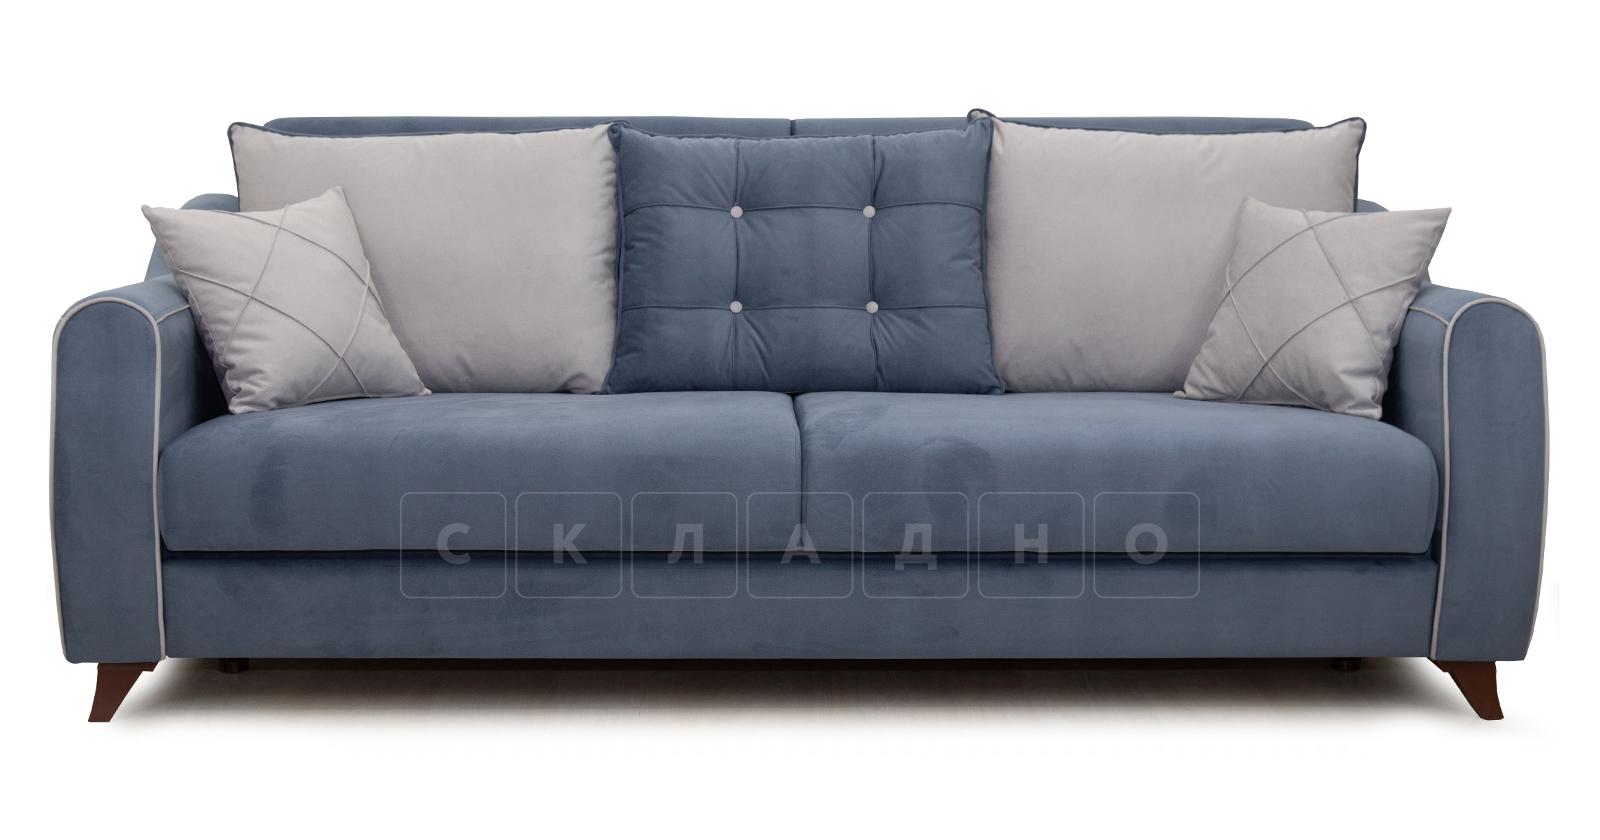 Диван-кровать Флэтфорд серо-синий фото 3 | интернет-магазин Складно